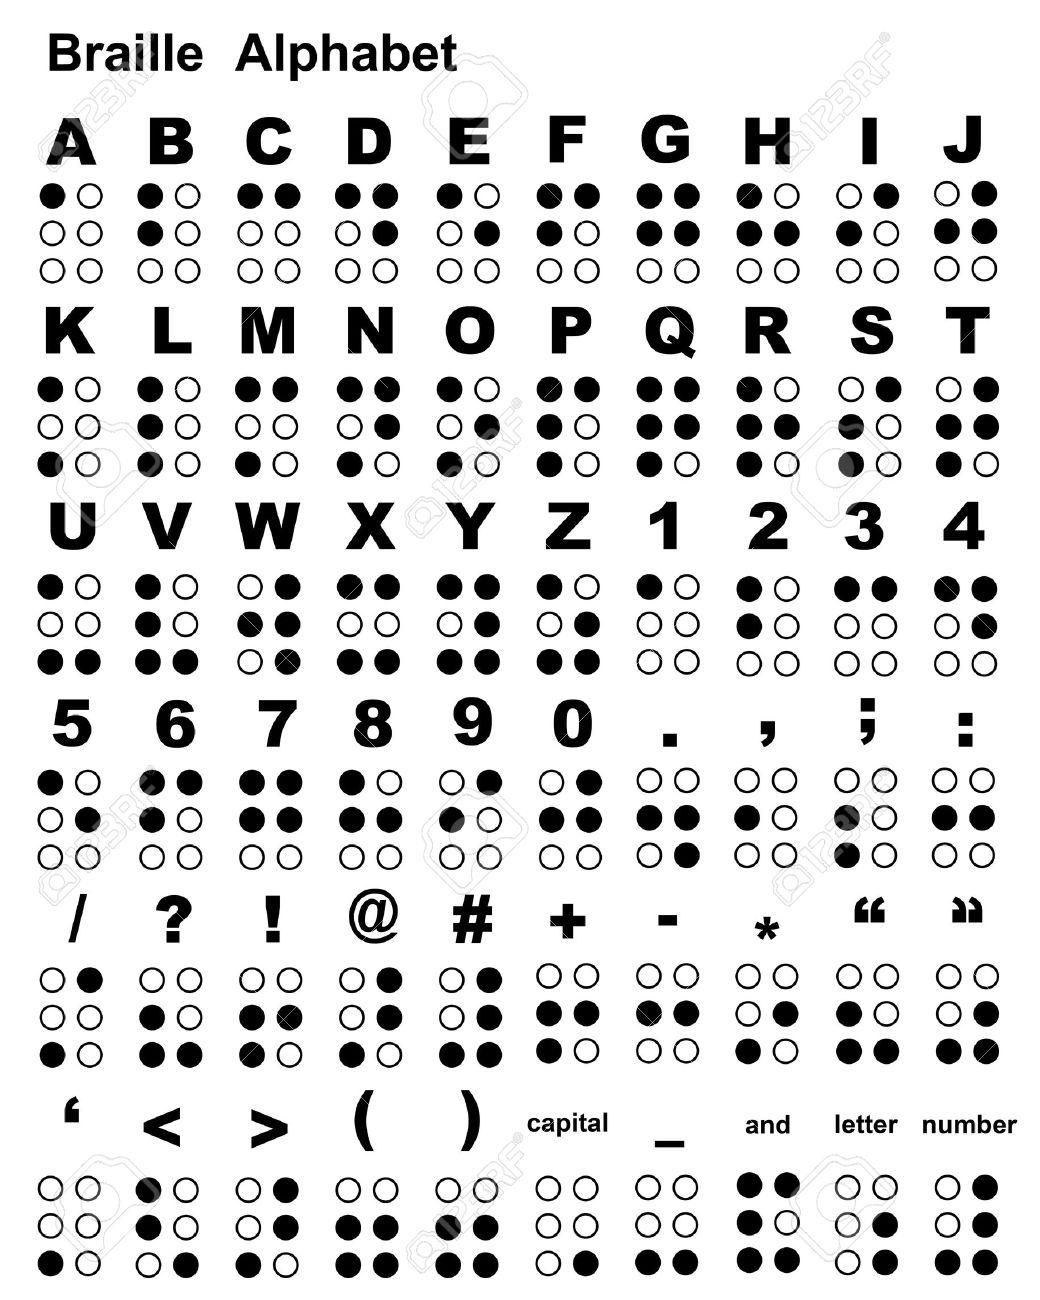 braille alphabet and symbols photo braille alphabet isolated on white